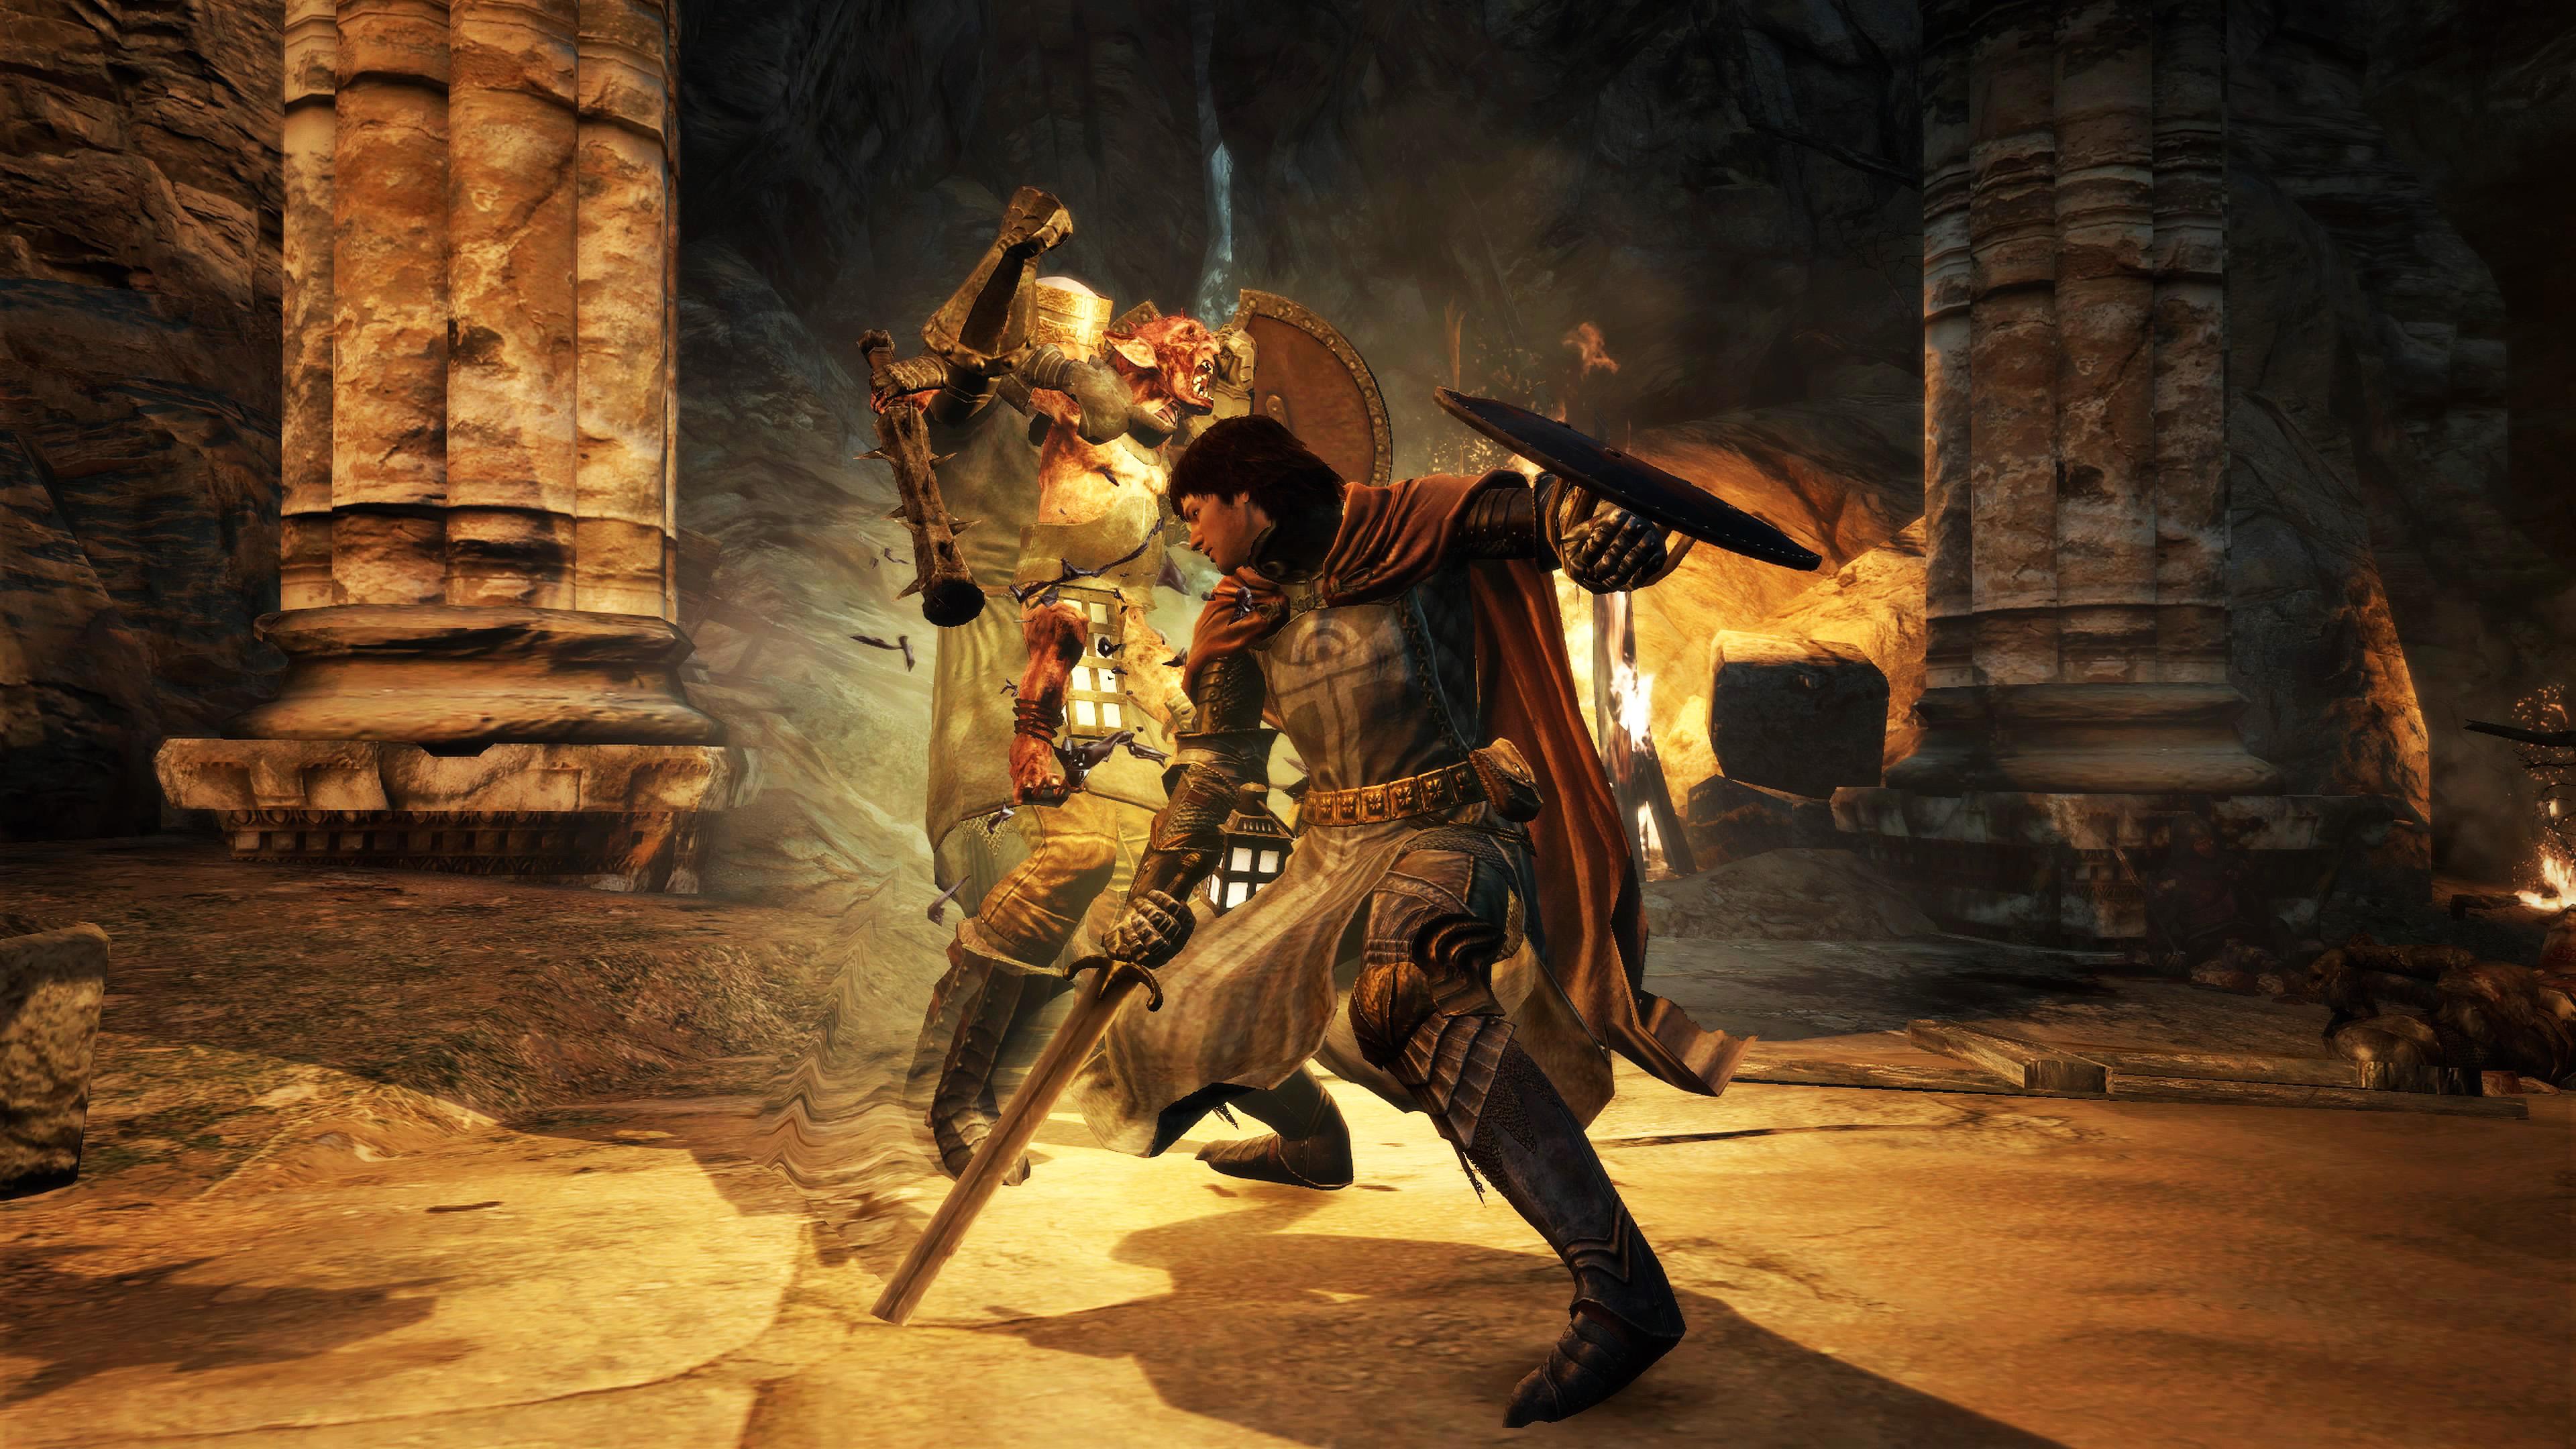 3. října vyjde Dragon's Dogma: Dark Arisen pro PS4 a Xbox One 148233